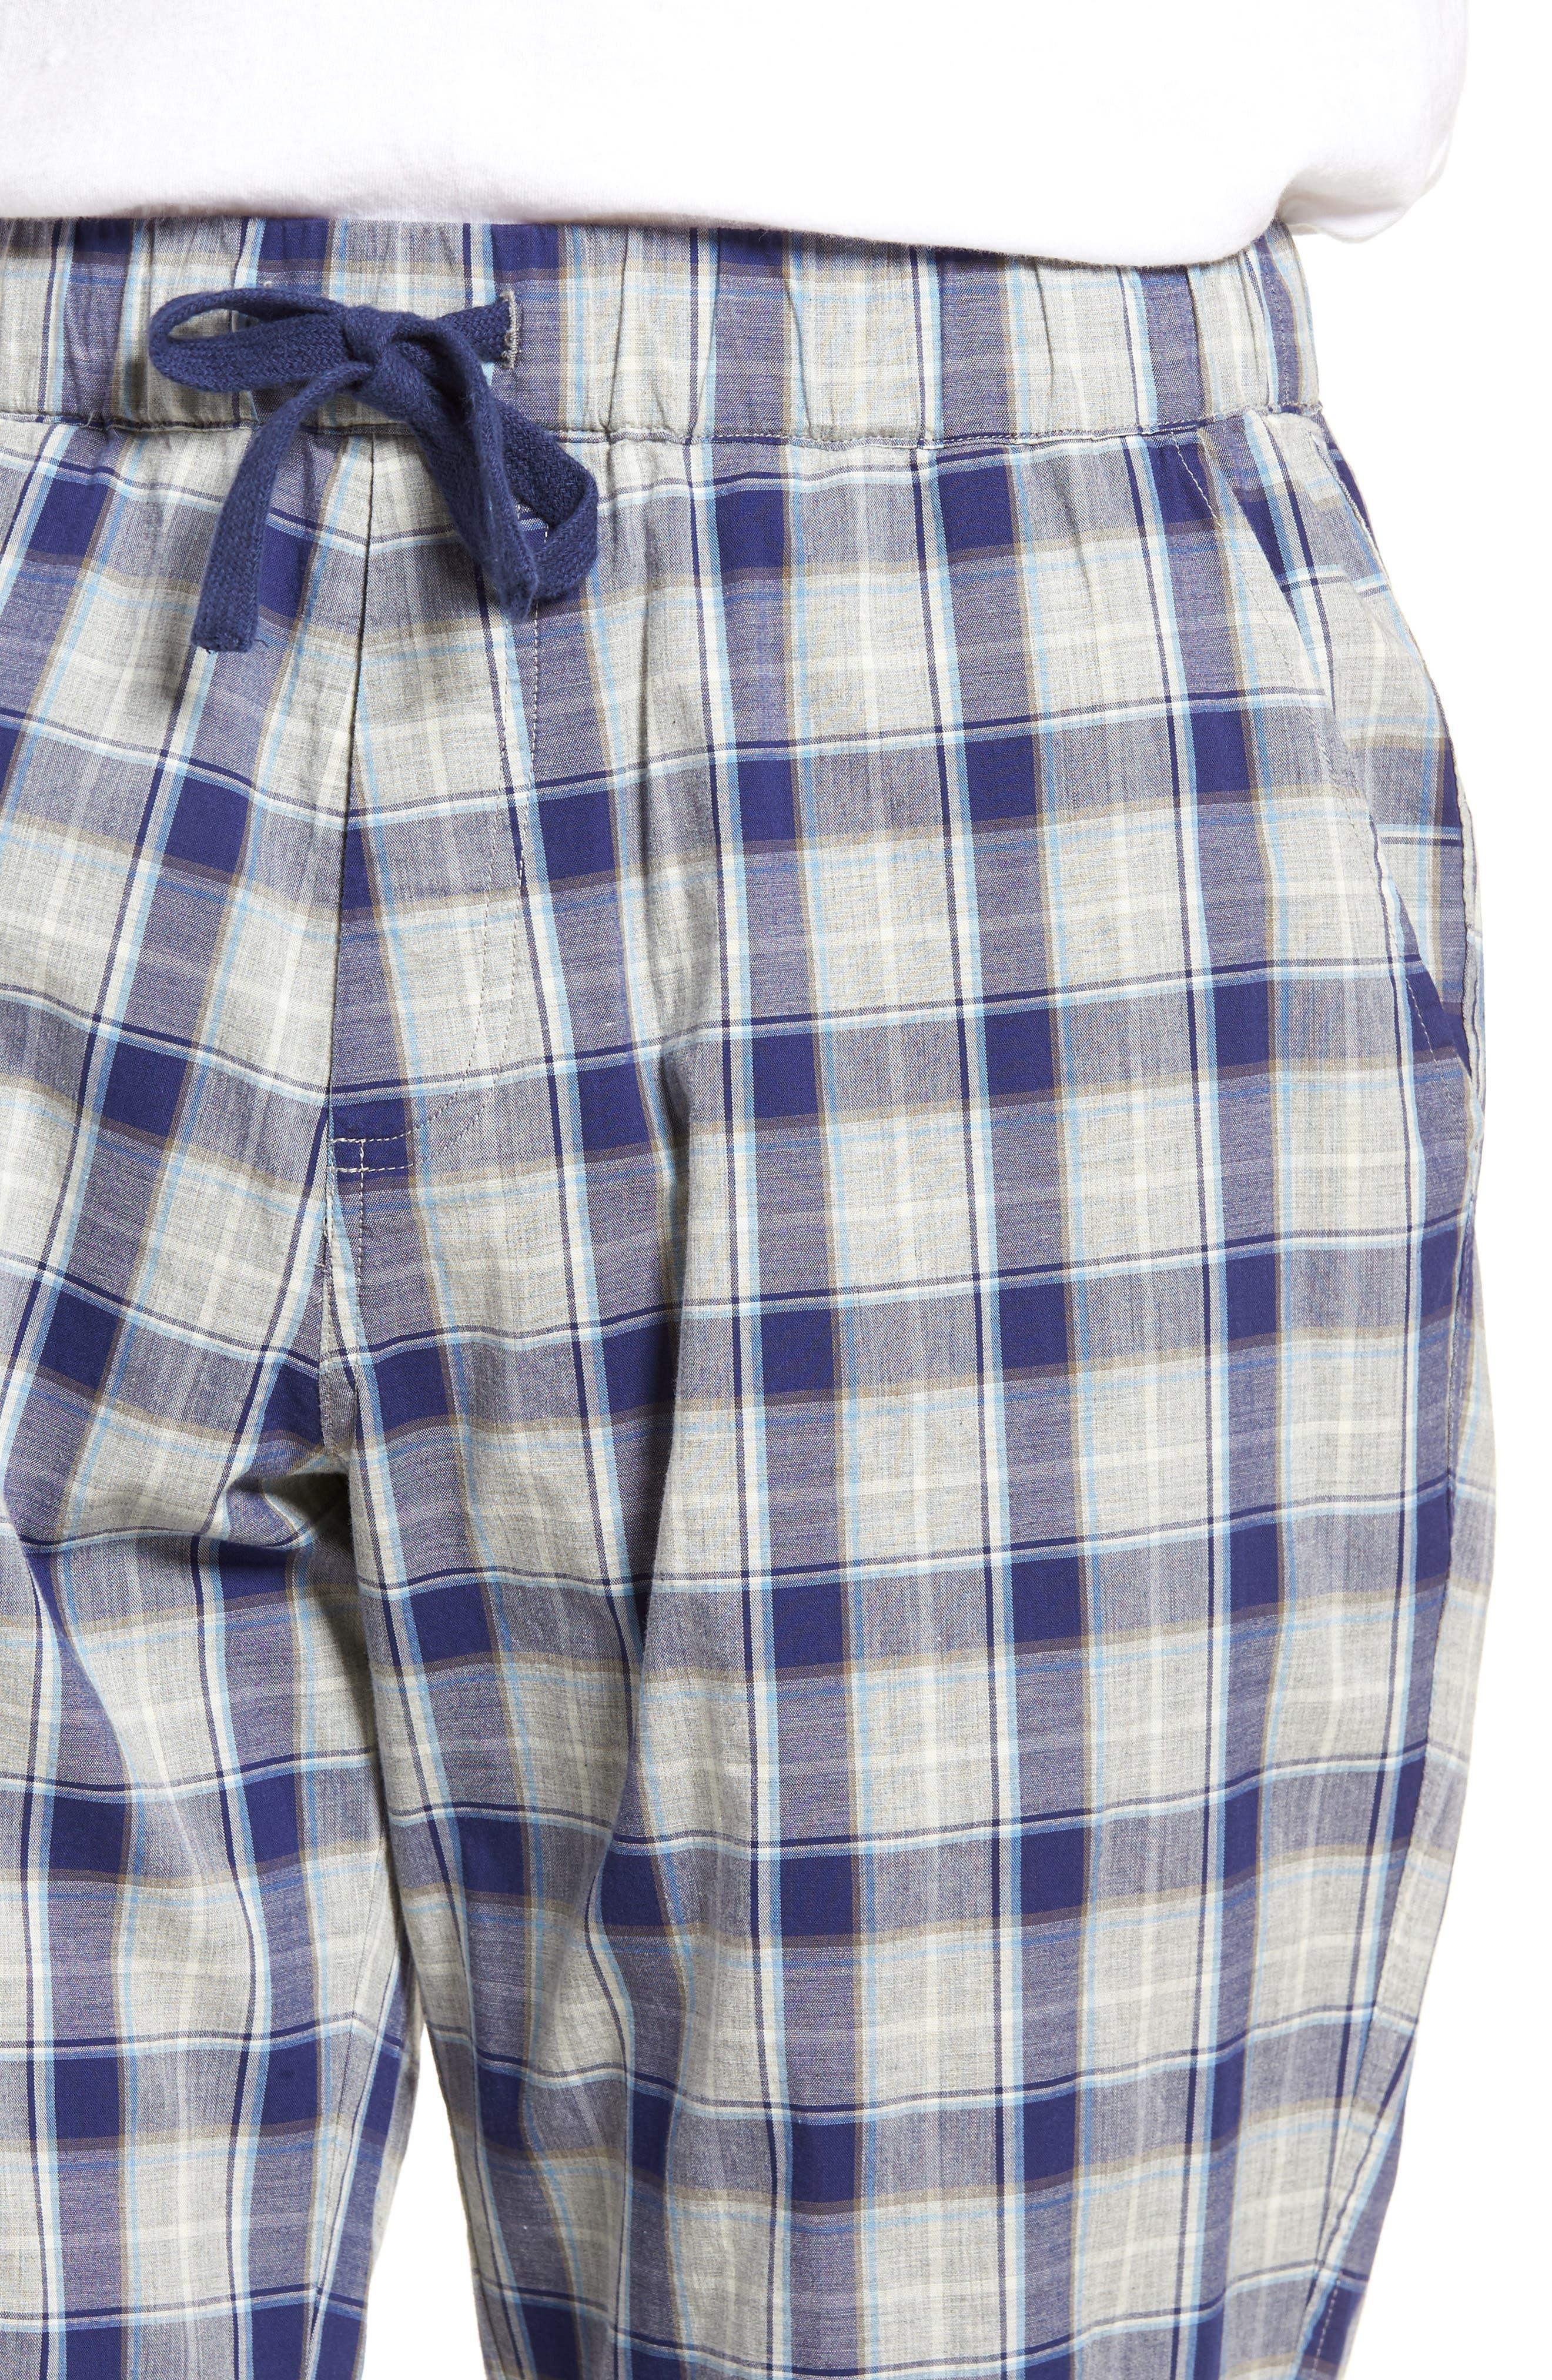 Flynn Plaid Cotton Lounge Pants,                             Alternate thumbnail 4, color,                             Navy